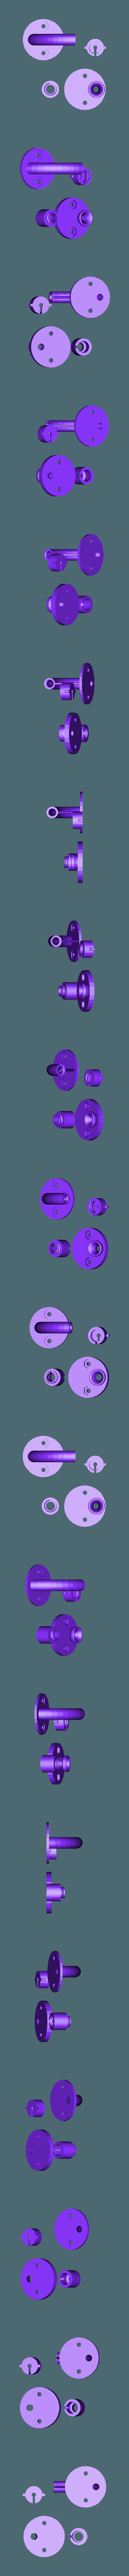 guia_de_filamento_90_grados.stl Download free STL file Filament box project • 3D printable design, raulrrojas